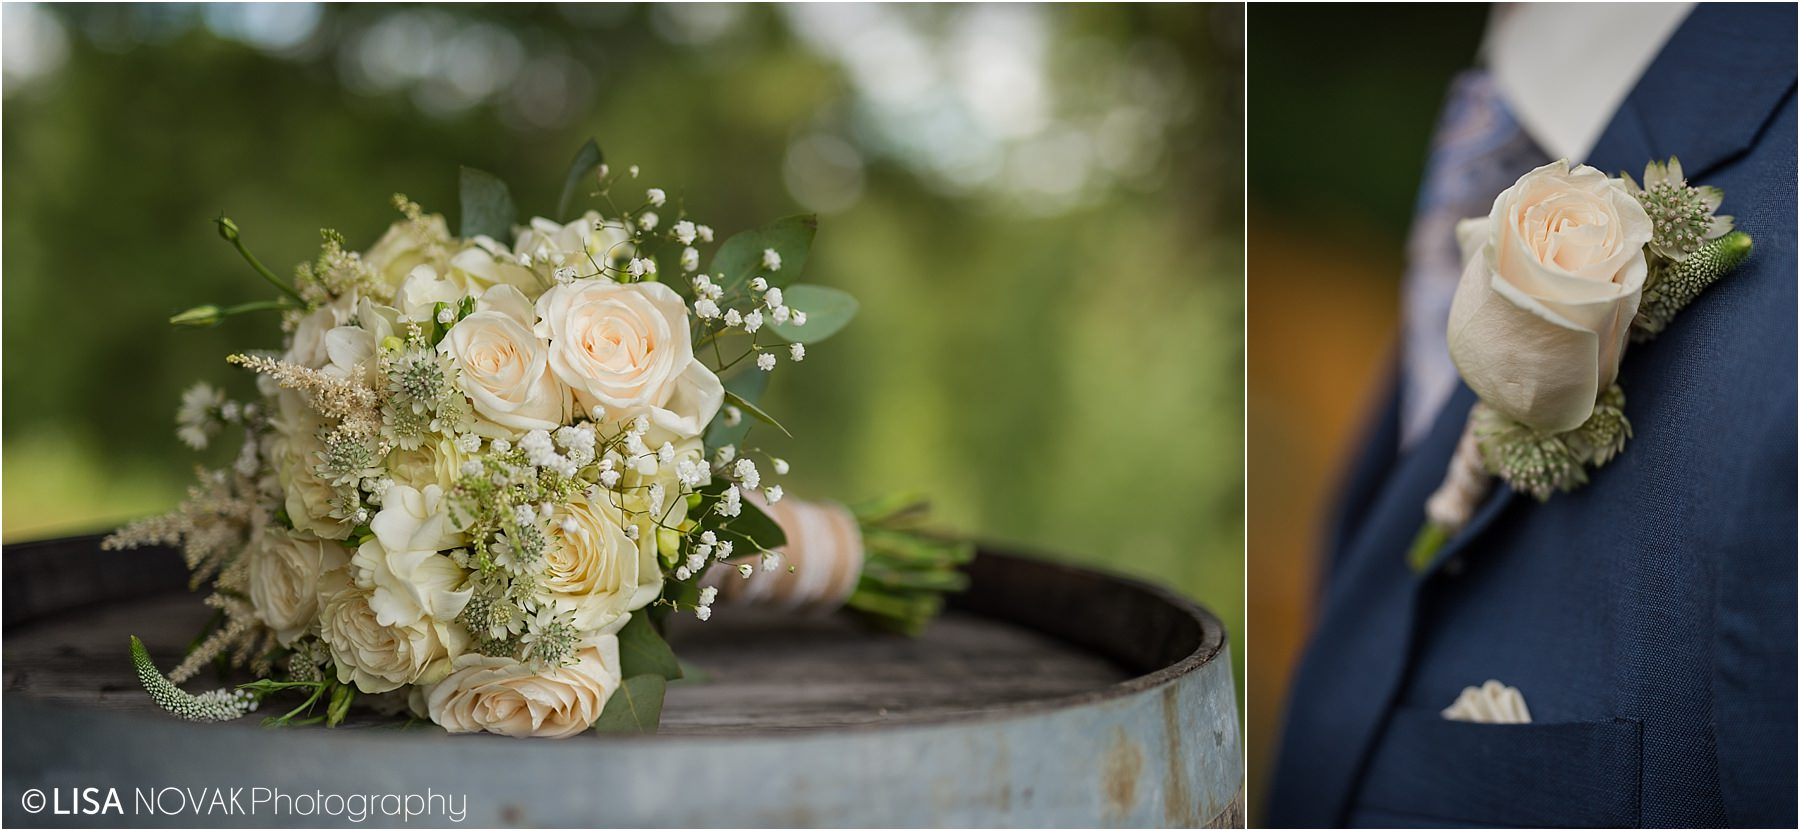 Kamloops wedding photographer details detail shot bouquet burlap lace cream green roses astilbe boutonniere blue tux tuxedo groom style